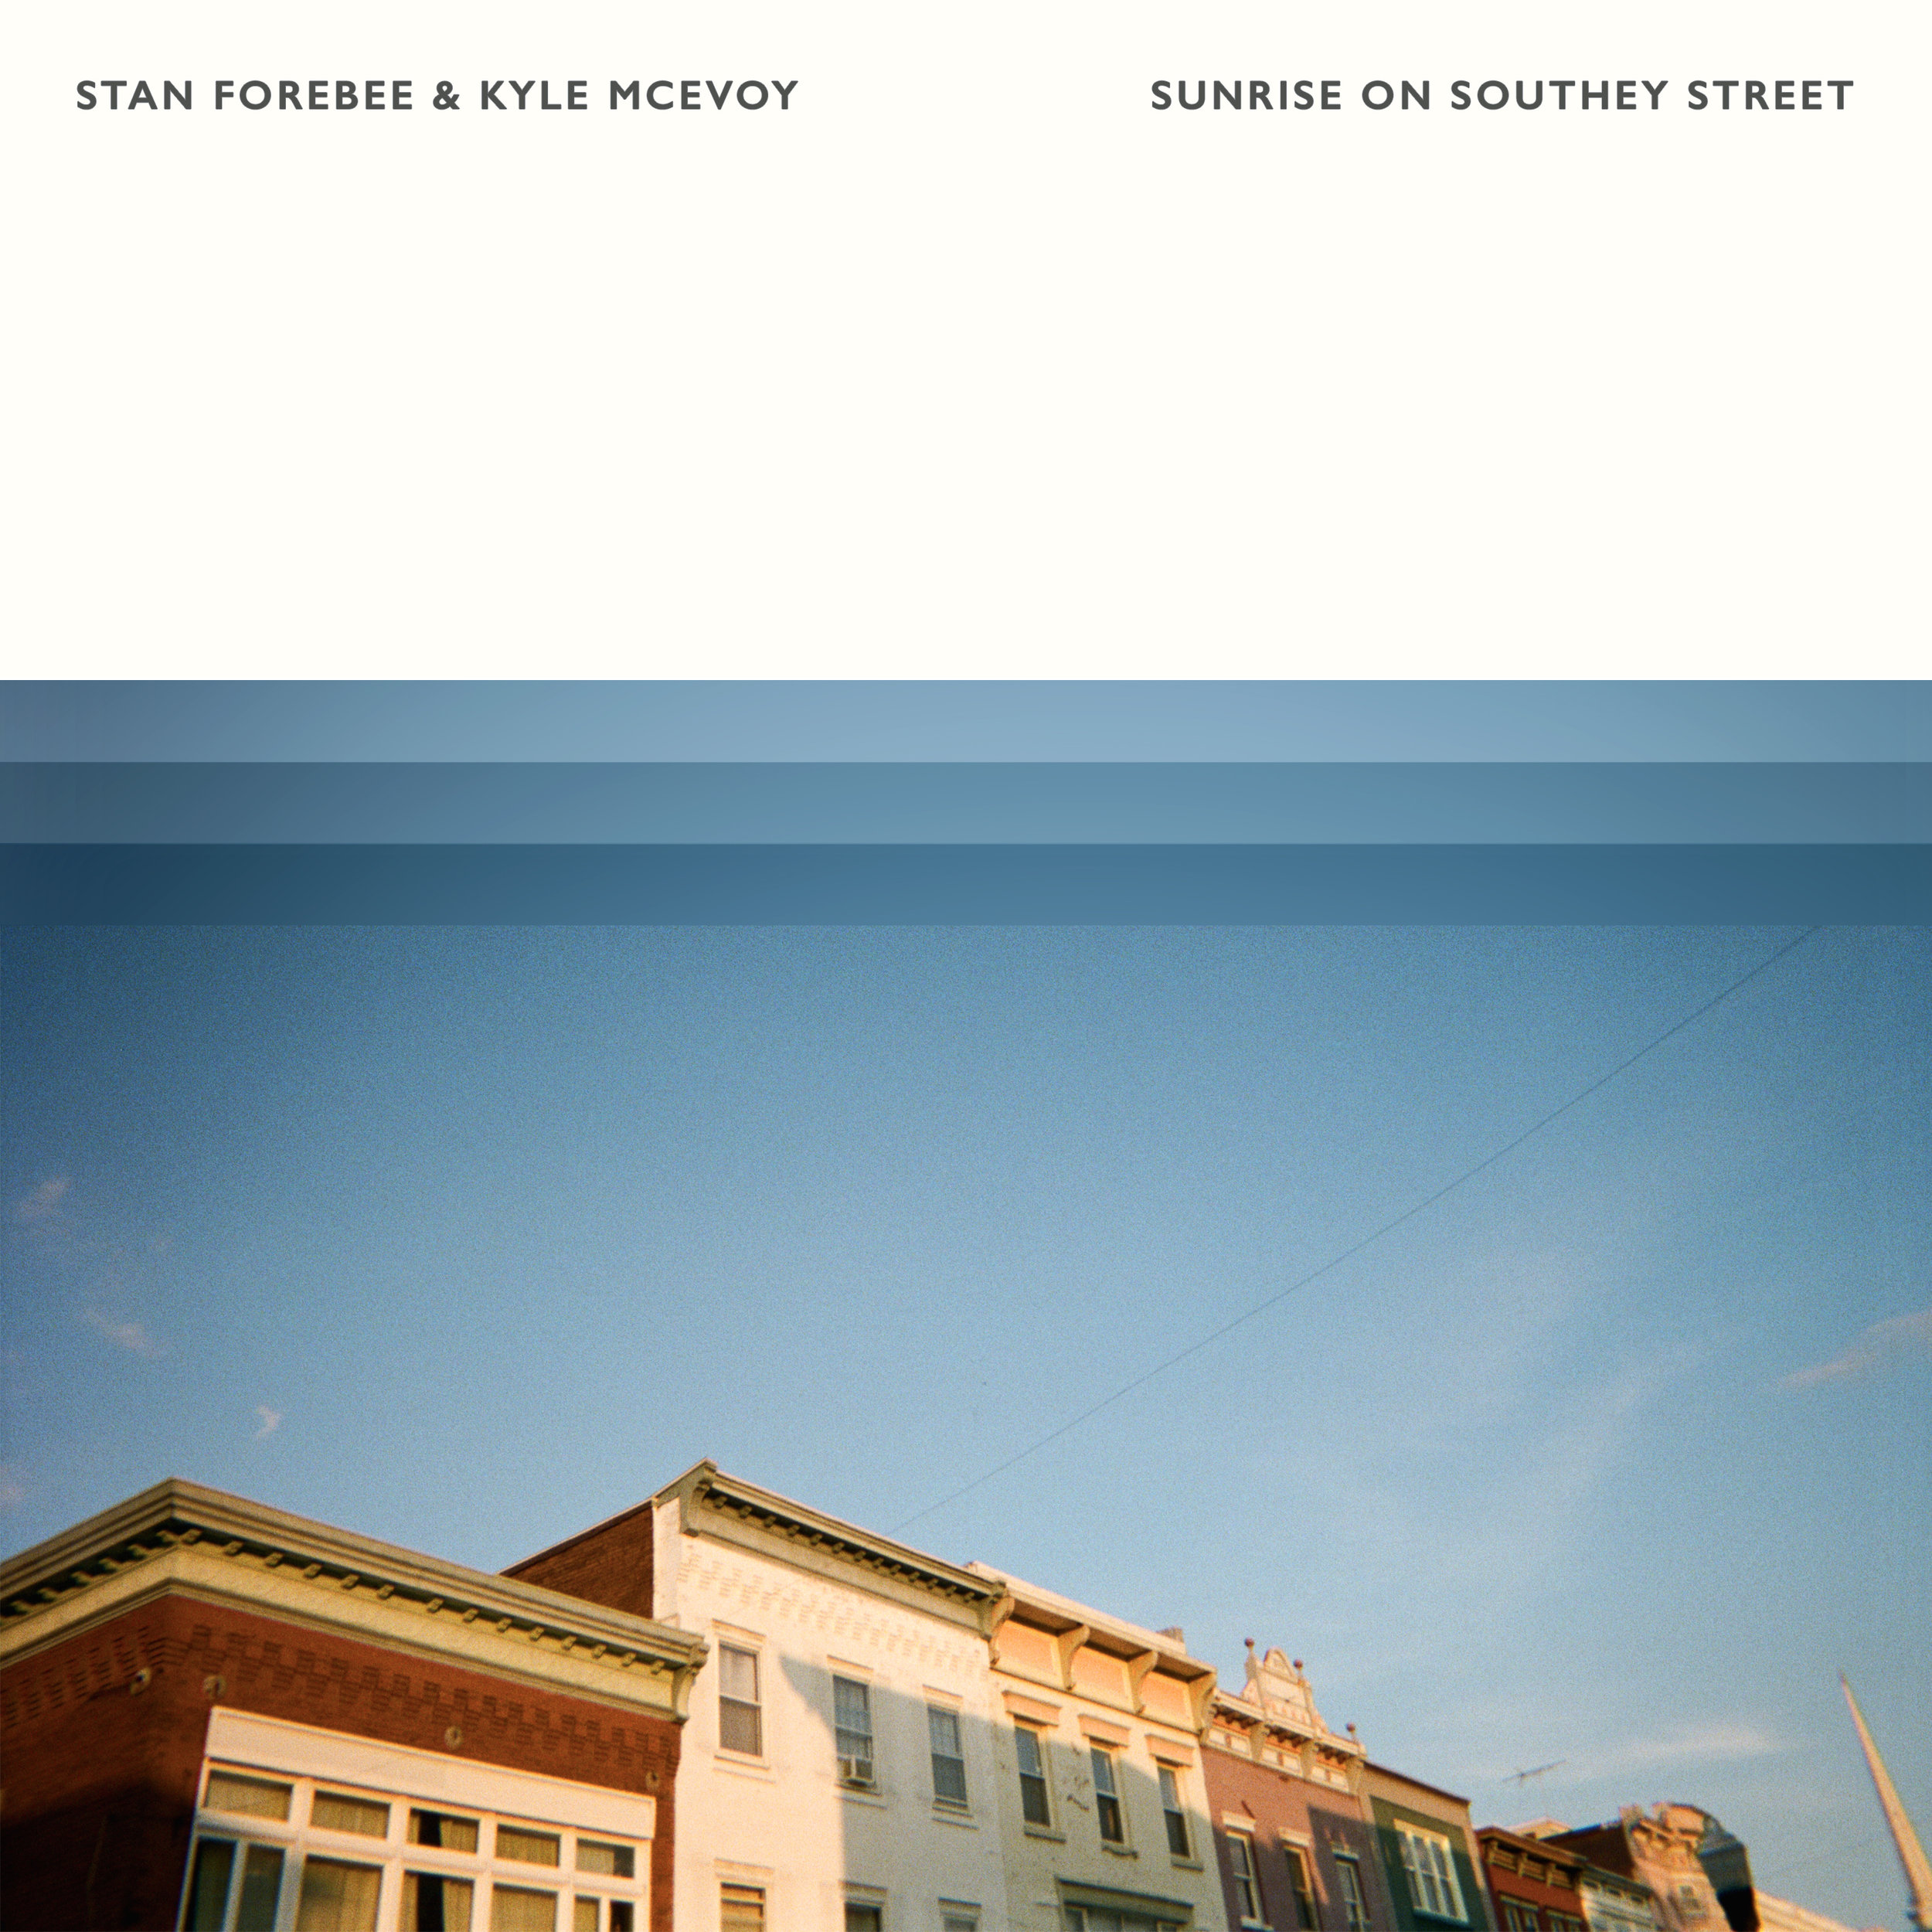 Stan Forebee & Kyle McEvoy - Sunrise On Southey Street